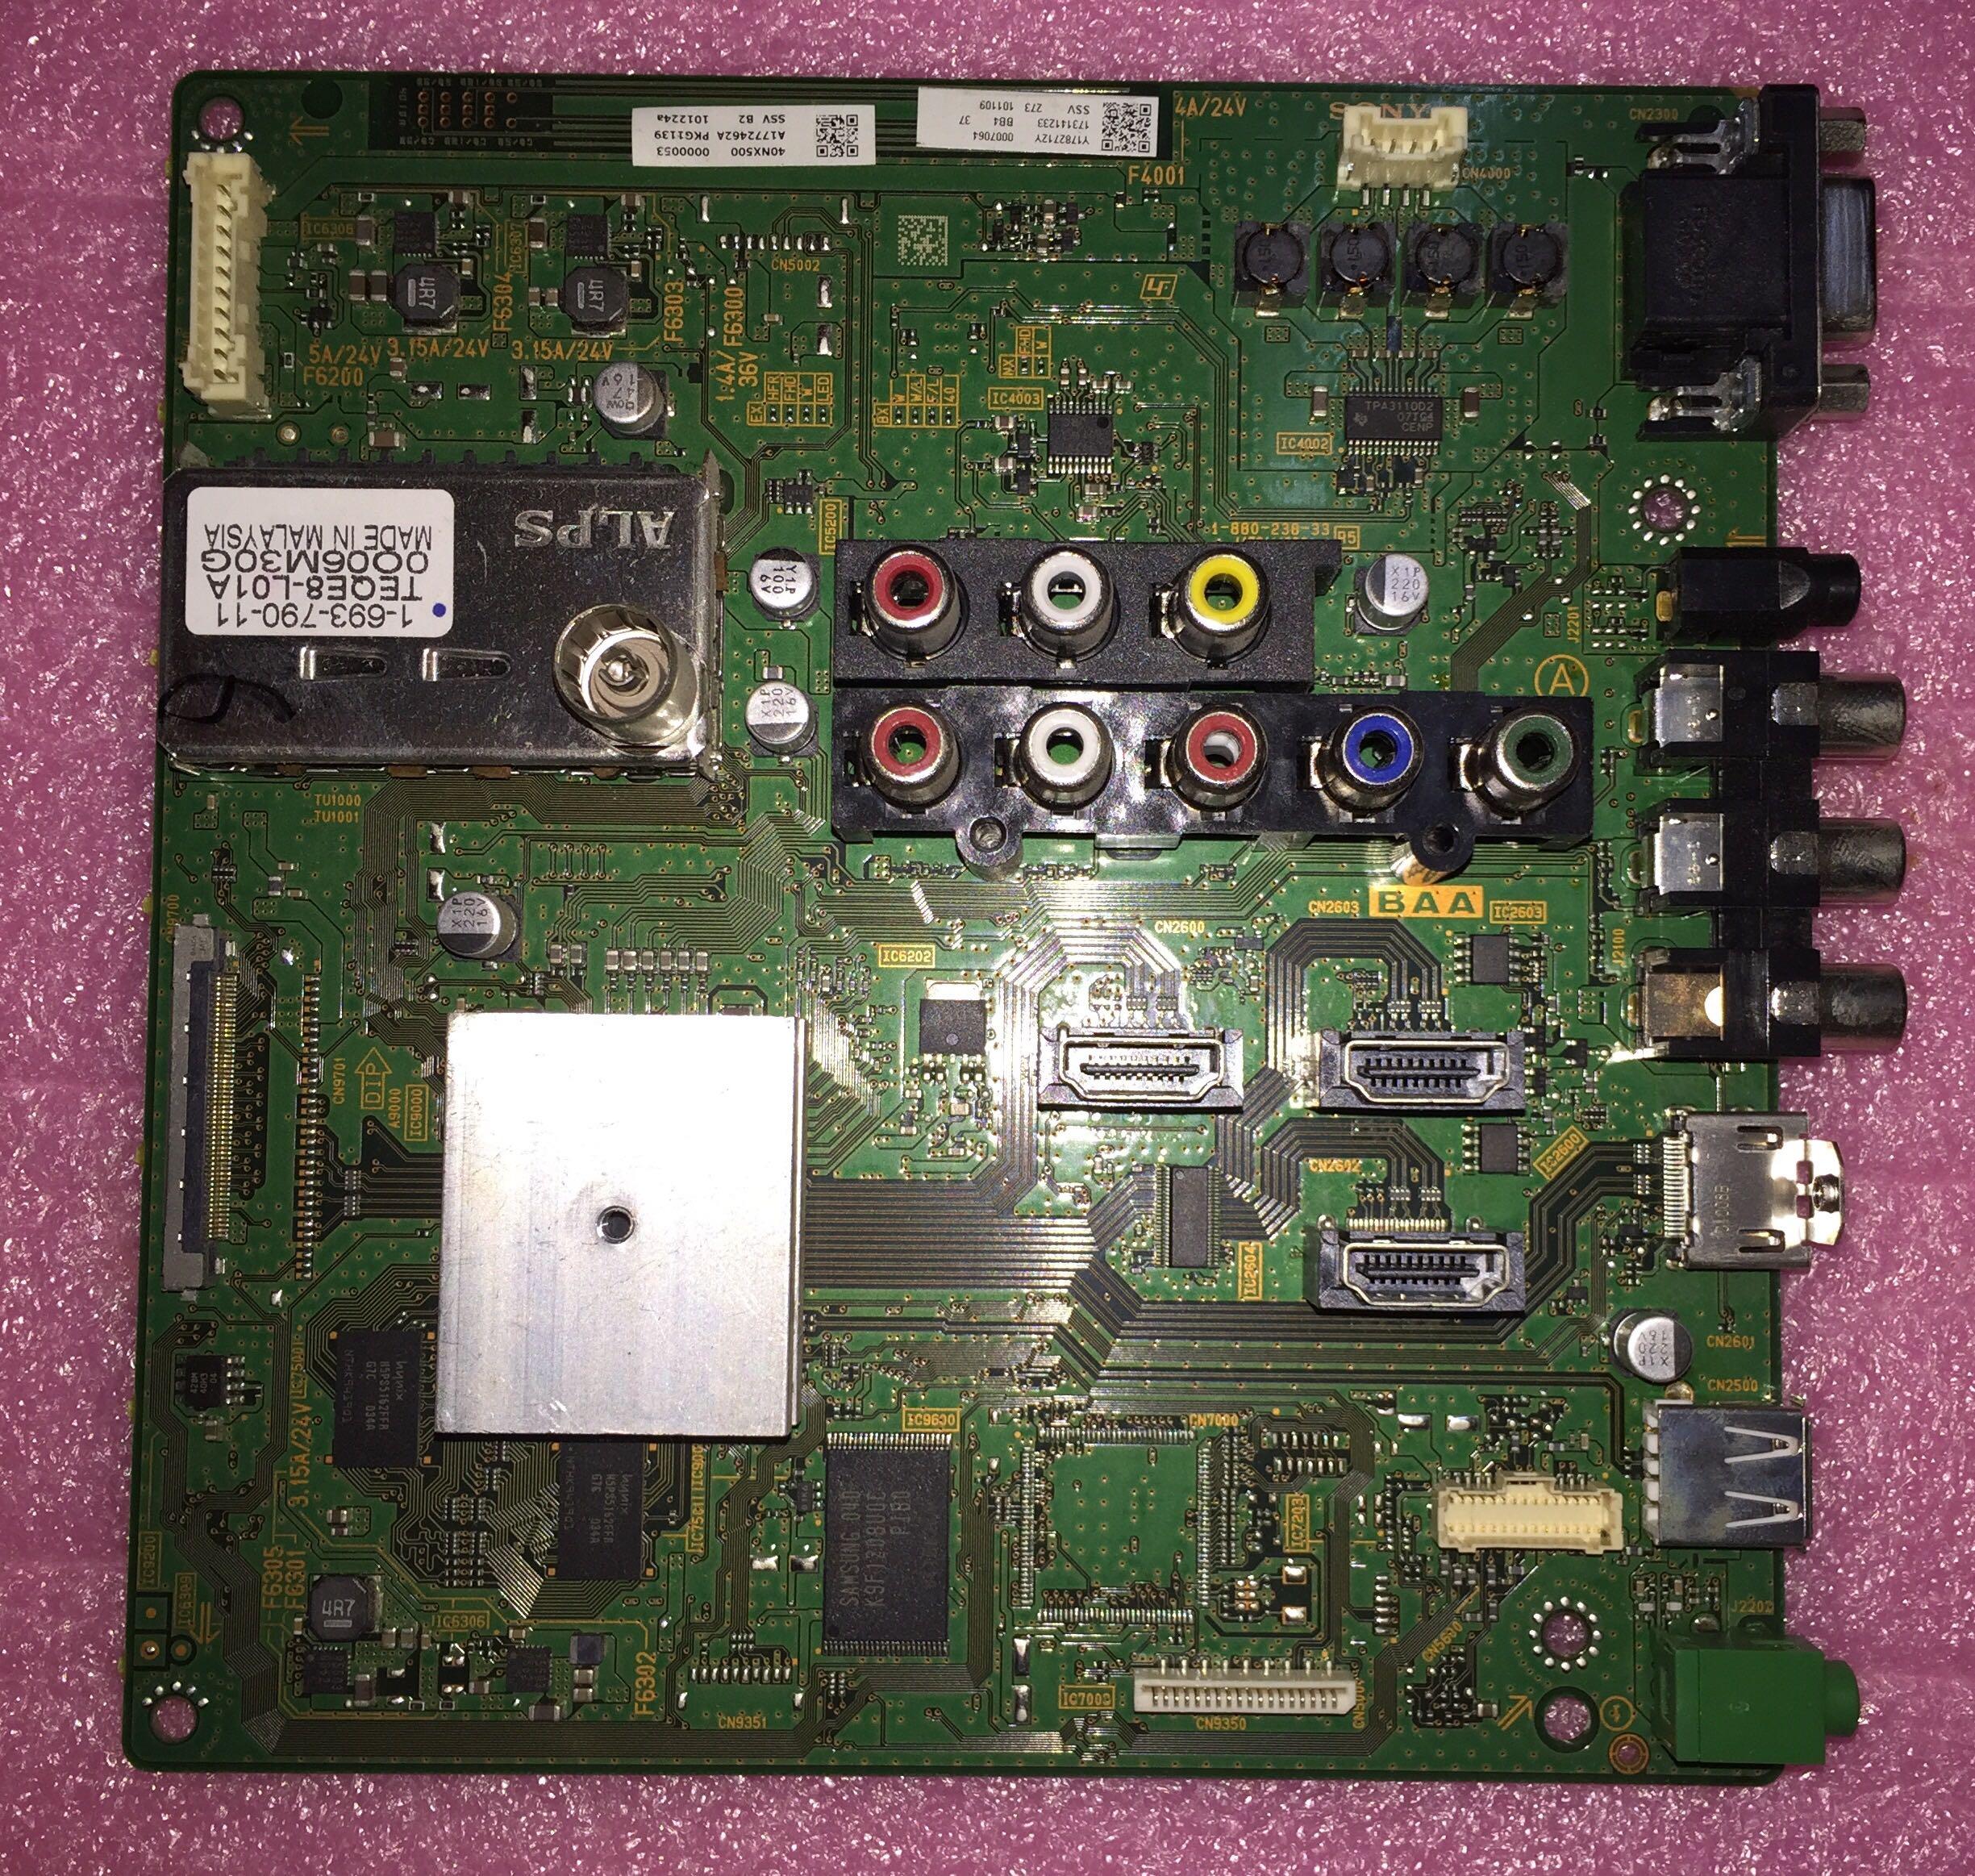 Новый Sony KLV-40NX500 Совет 1-880-238-32 1-880-238-33 A1782712A